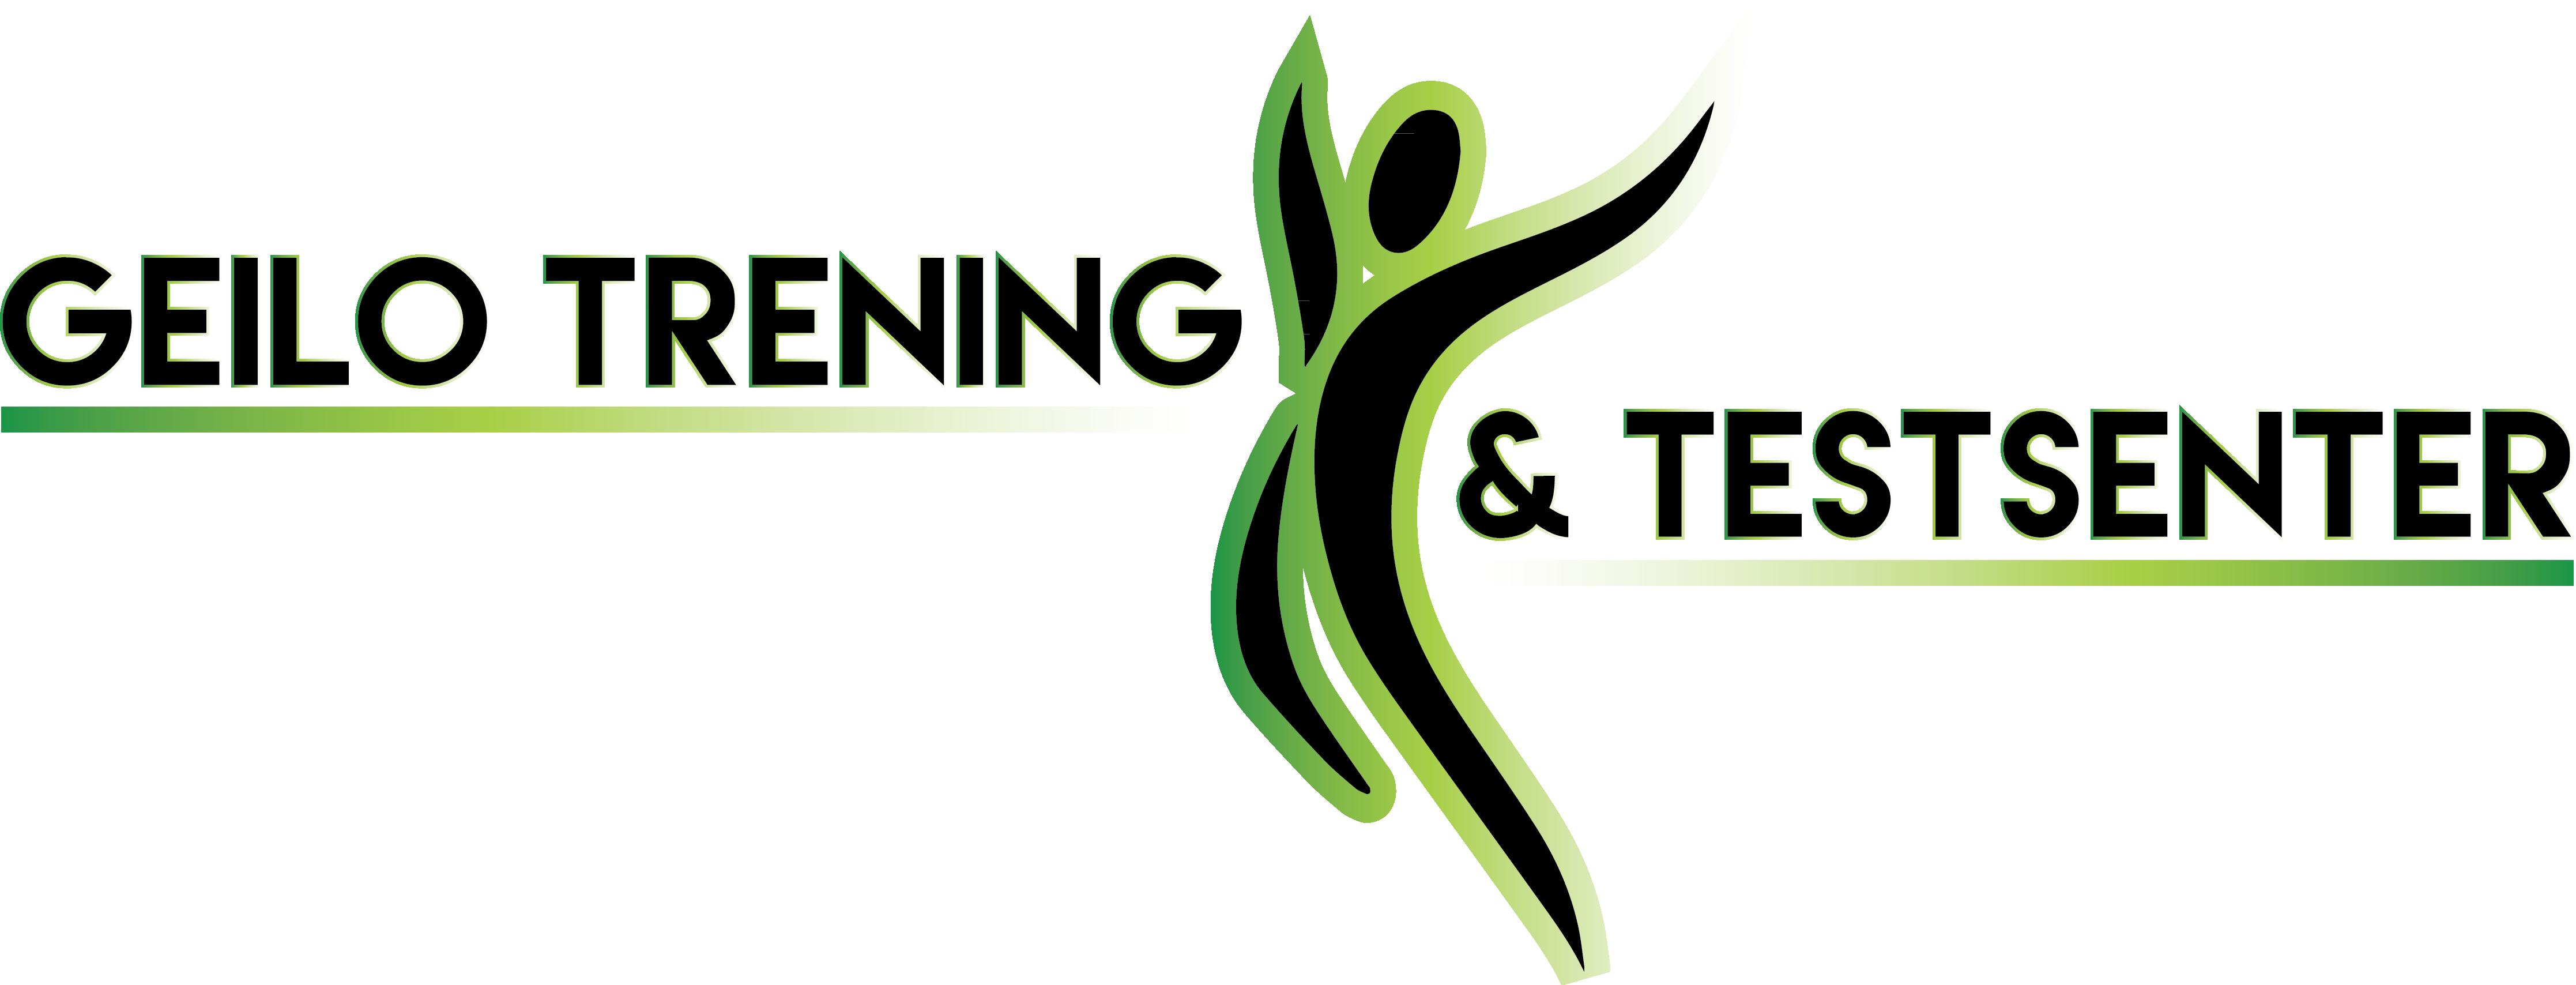 Geilo Trening & Testsenter logo